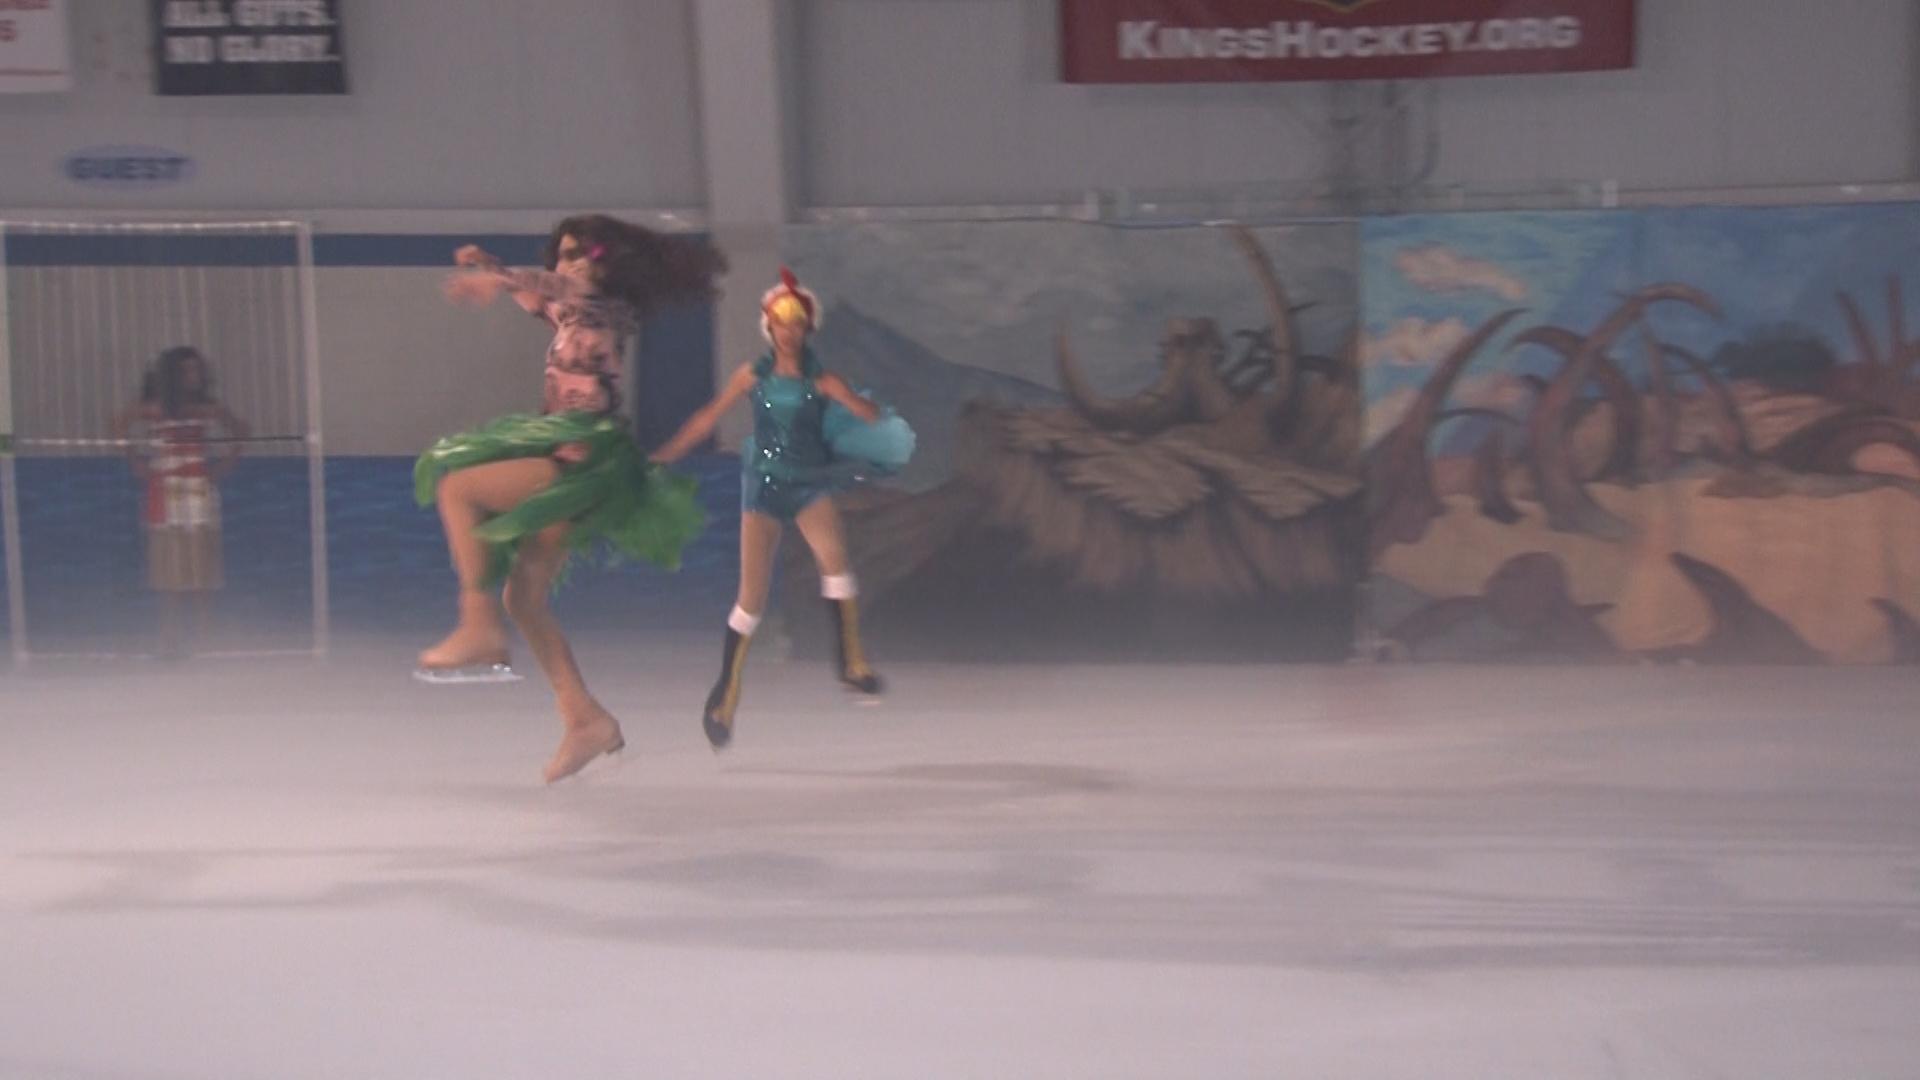 Power Play Maui Skate on Ice 071417.00_34_10_13.Still057.jpg